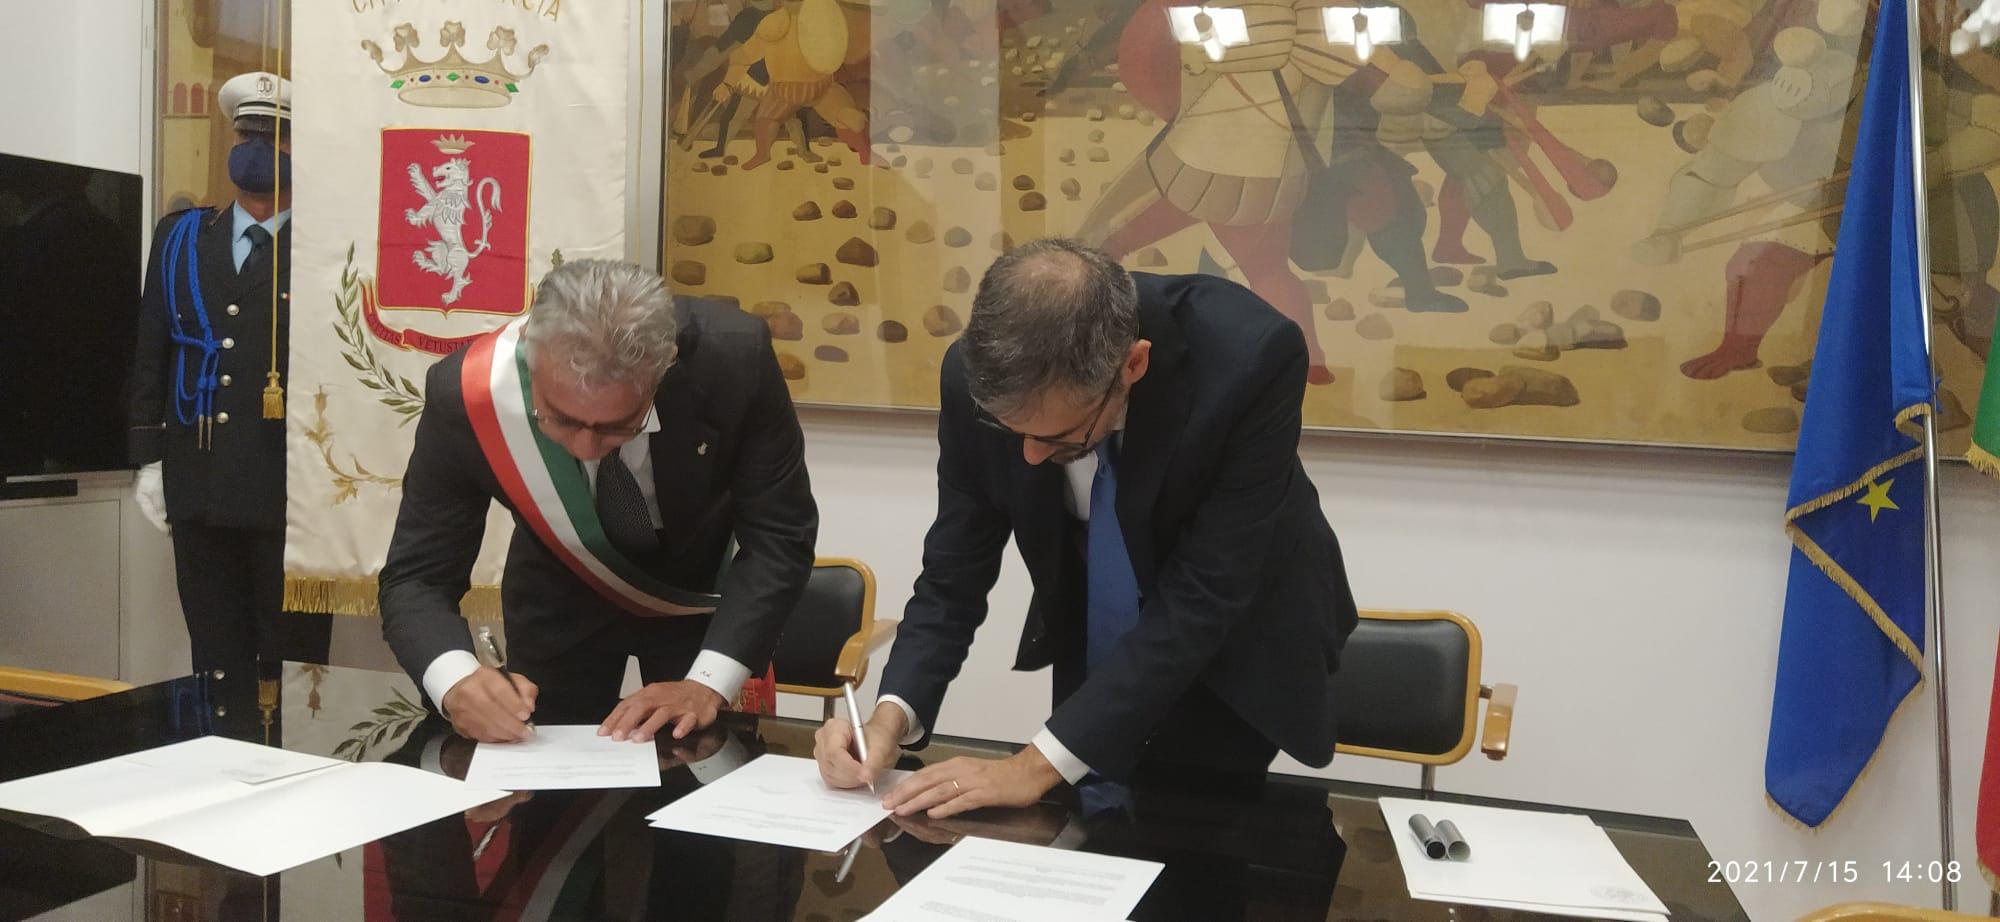 Accordo Unistra PG - Comune Norcia